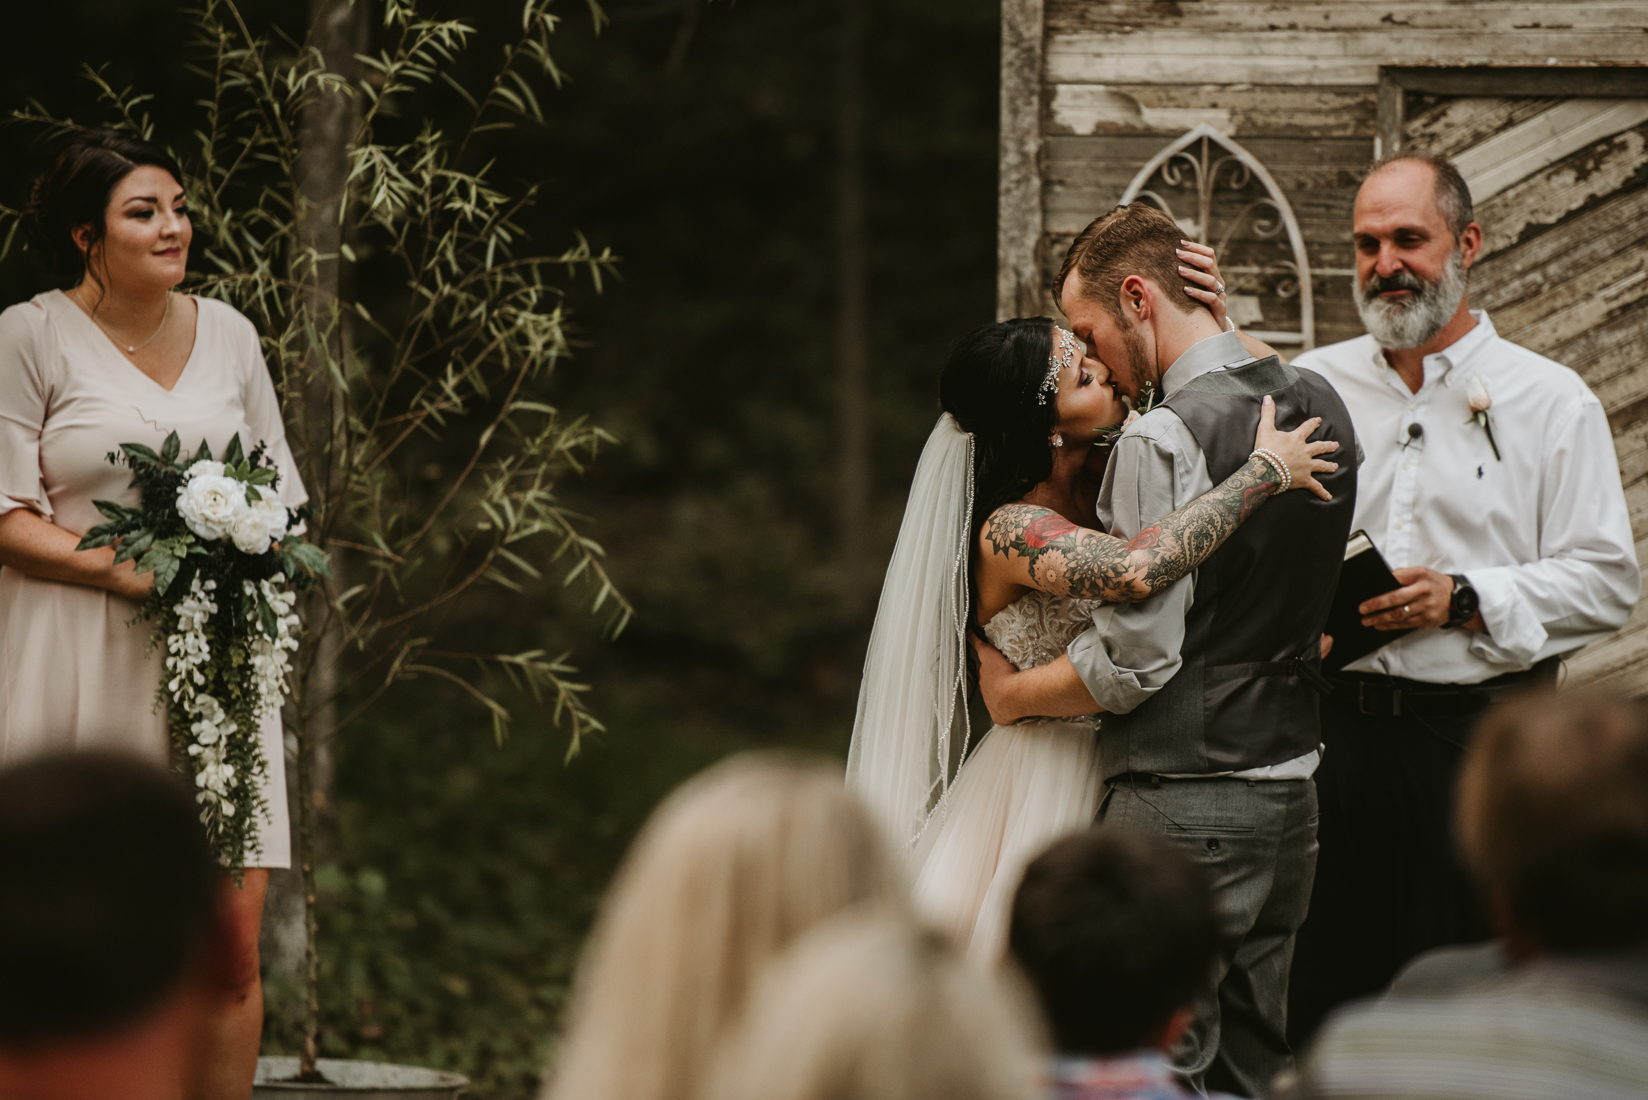 olivia_zay_wedding_09_2018-7690.jpg